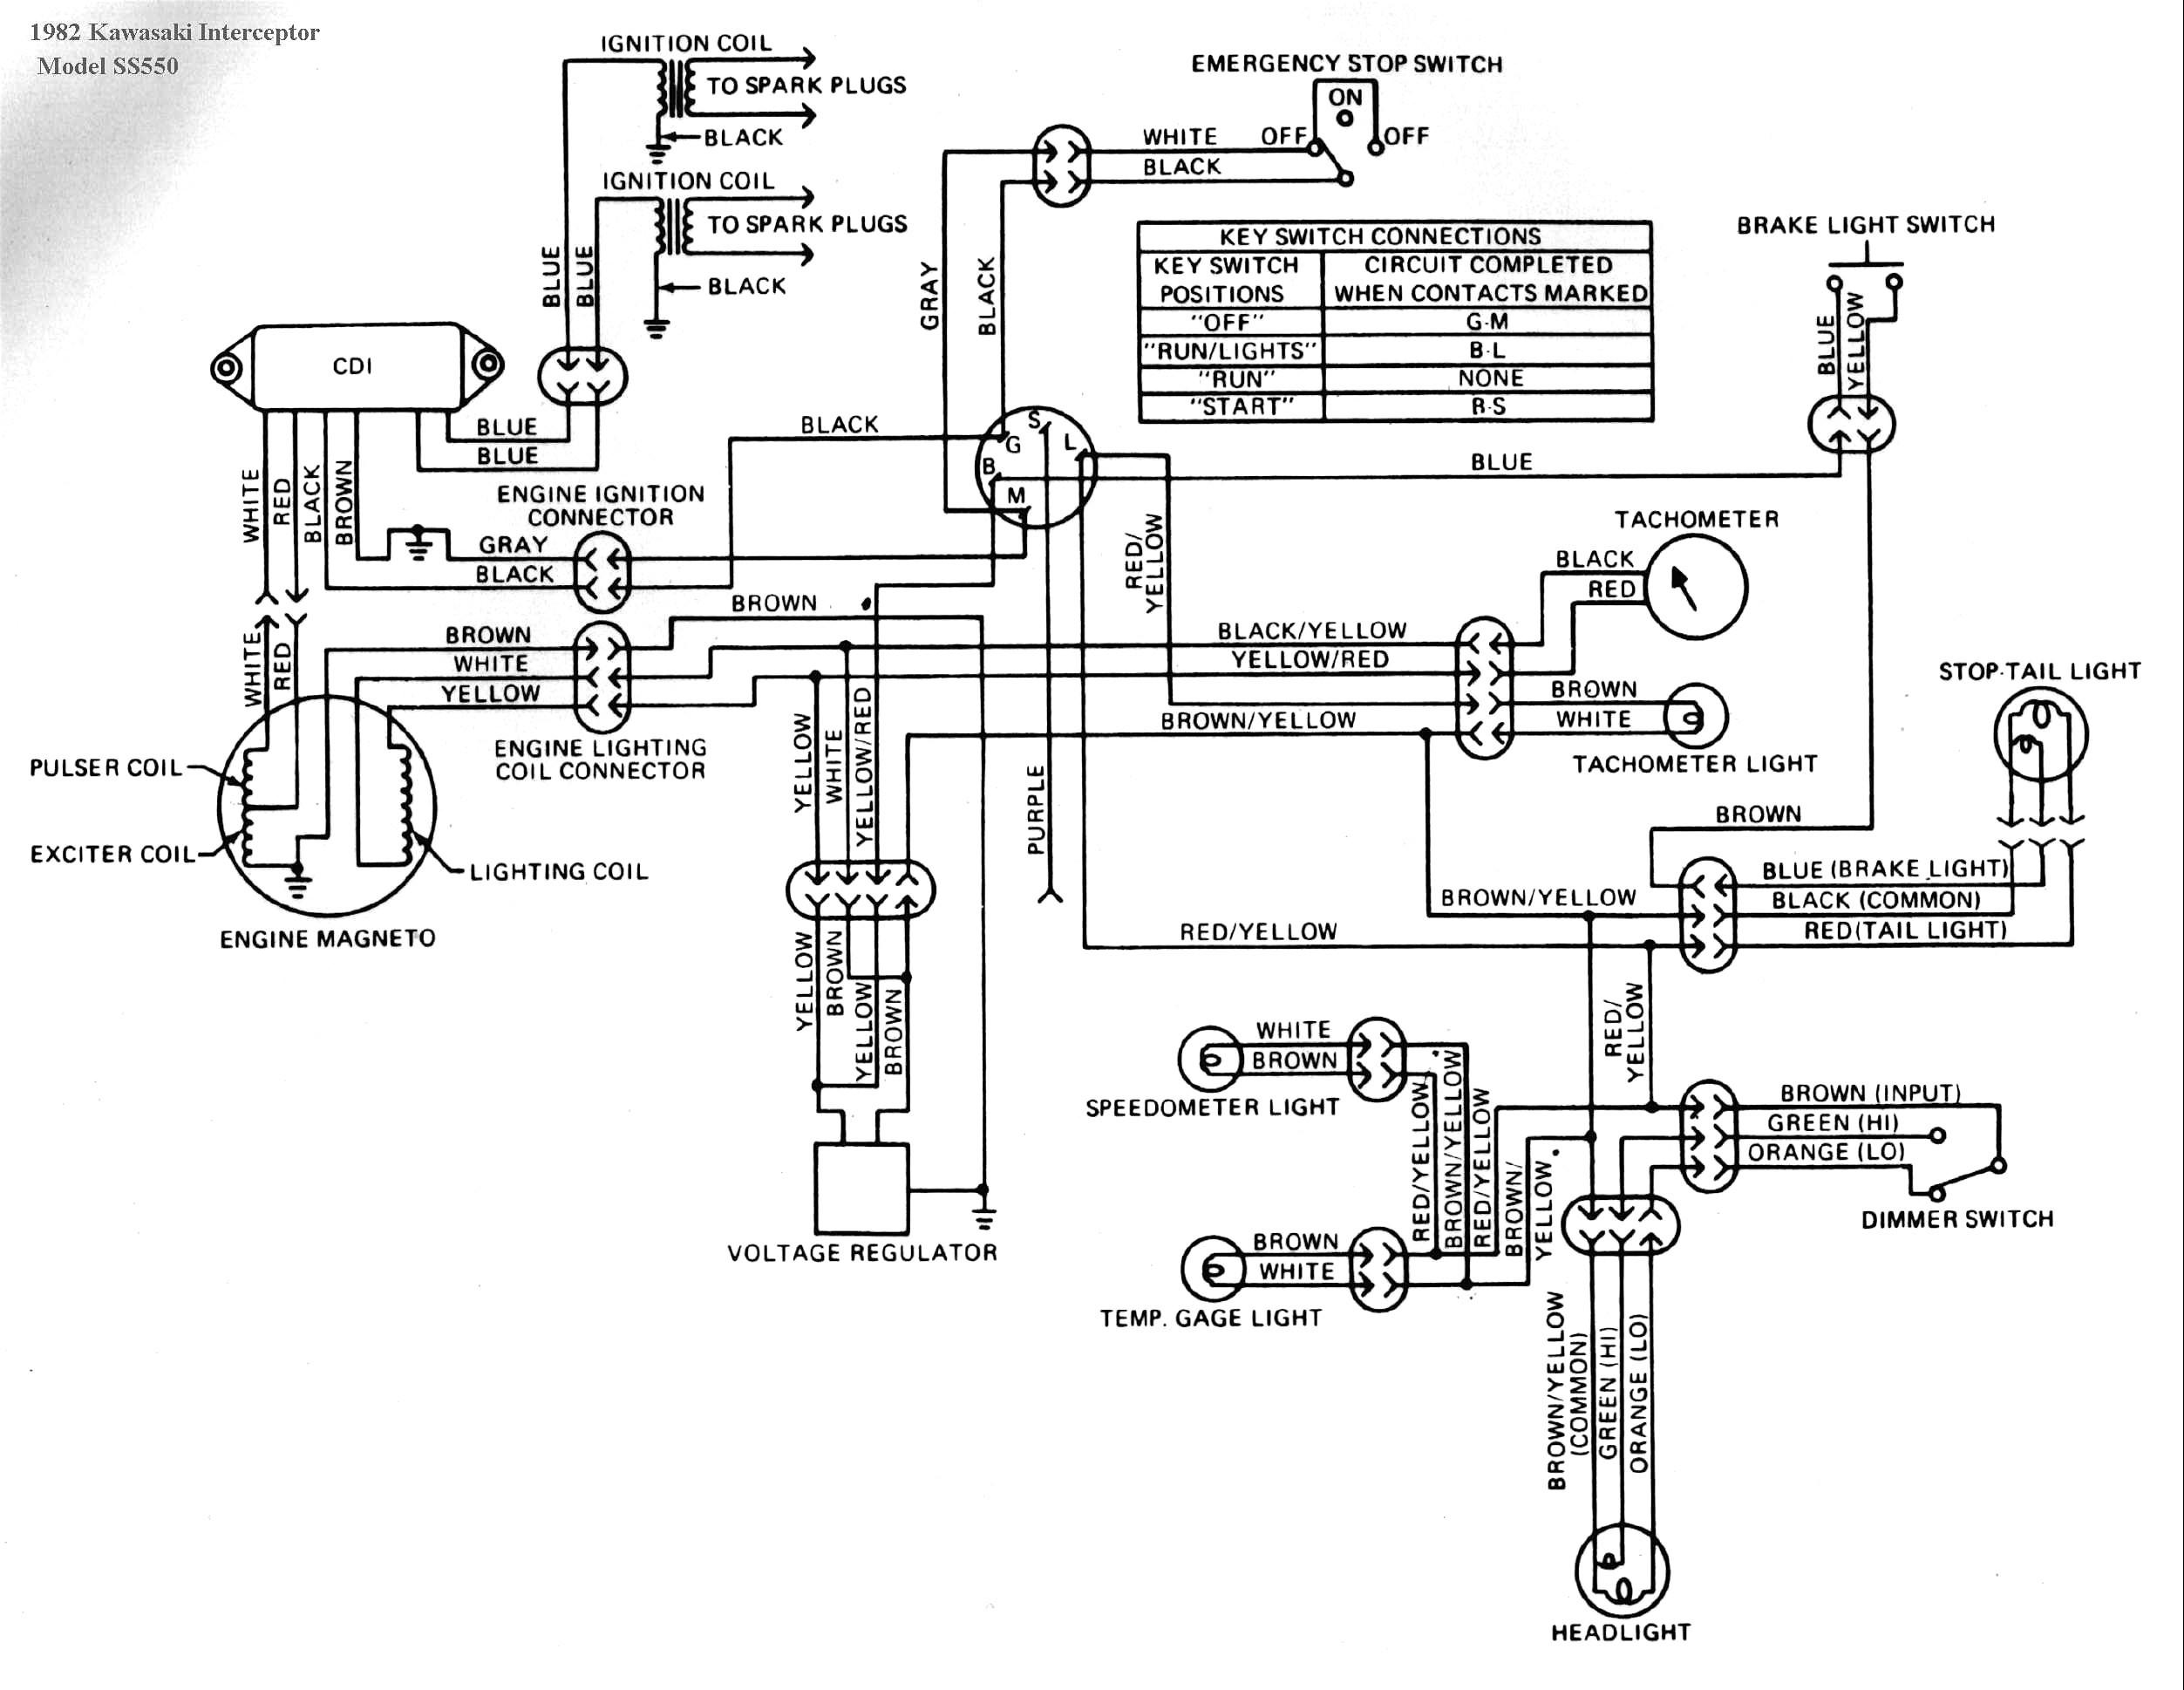 klx 250 wiring diagram wiring diagram save KLR 650